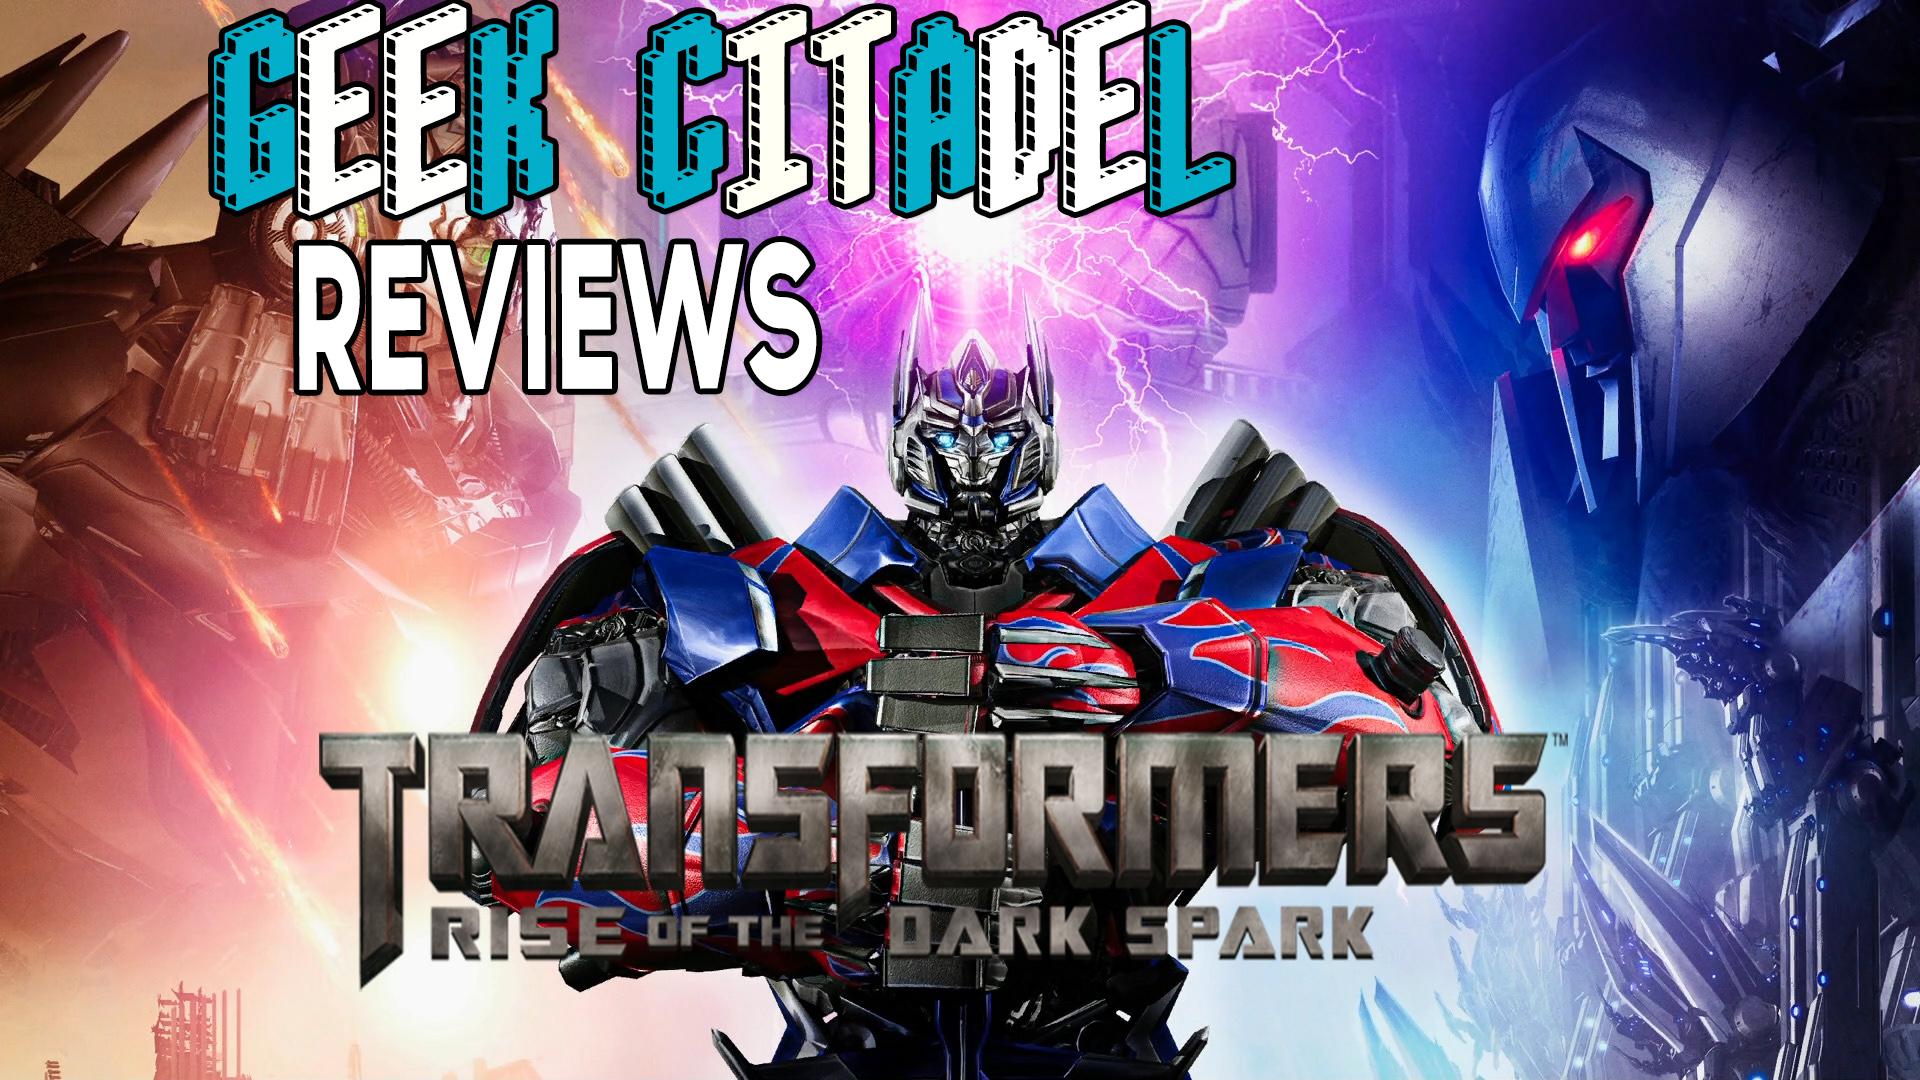 Geek Citadel Reviews – Transformers: Rise of the Dark Spark